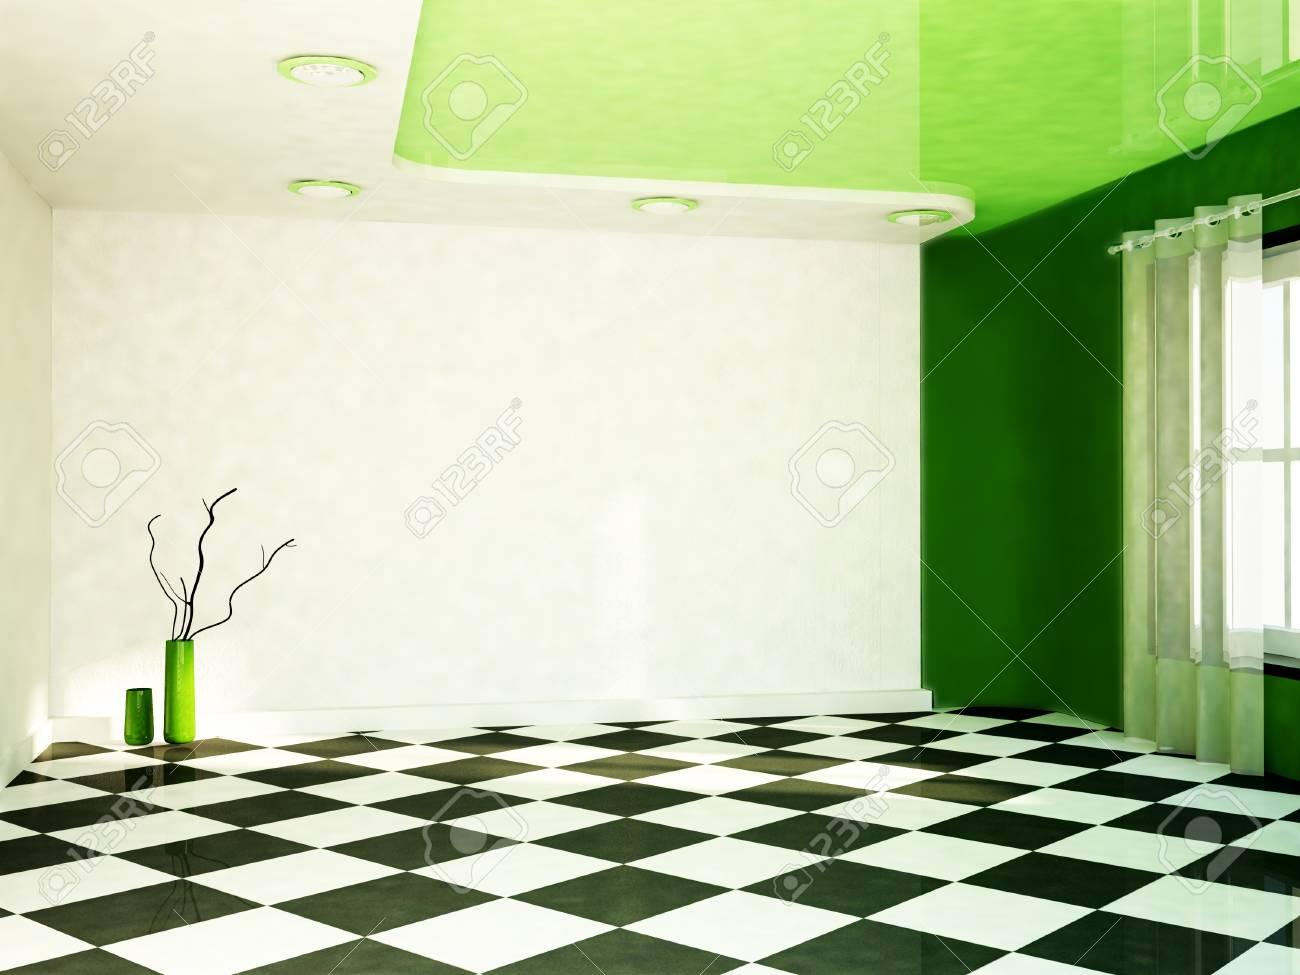 interior design scene with a window, the vases Stock Photo - 16709160